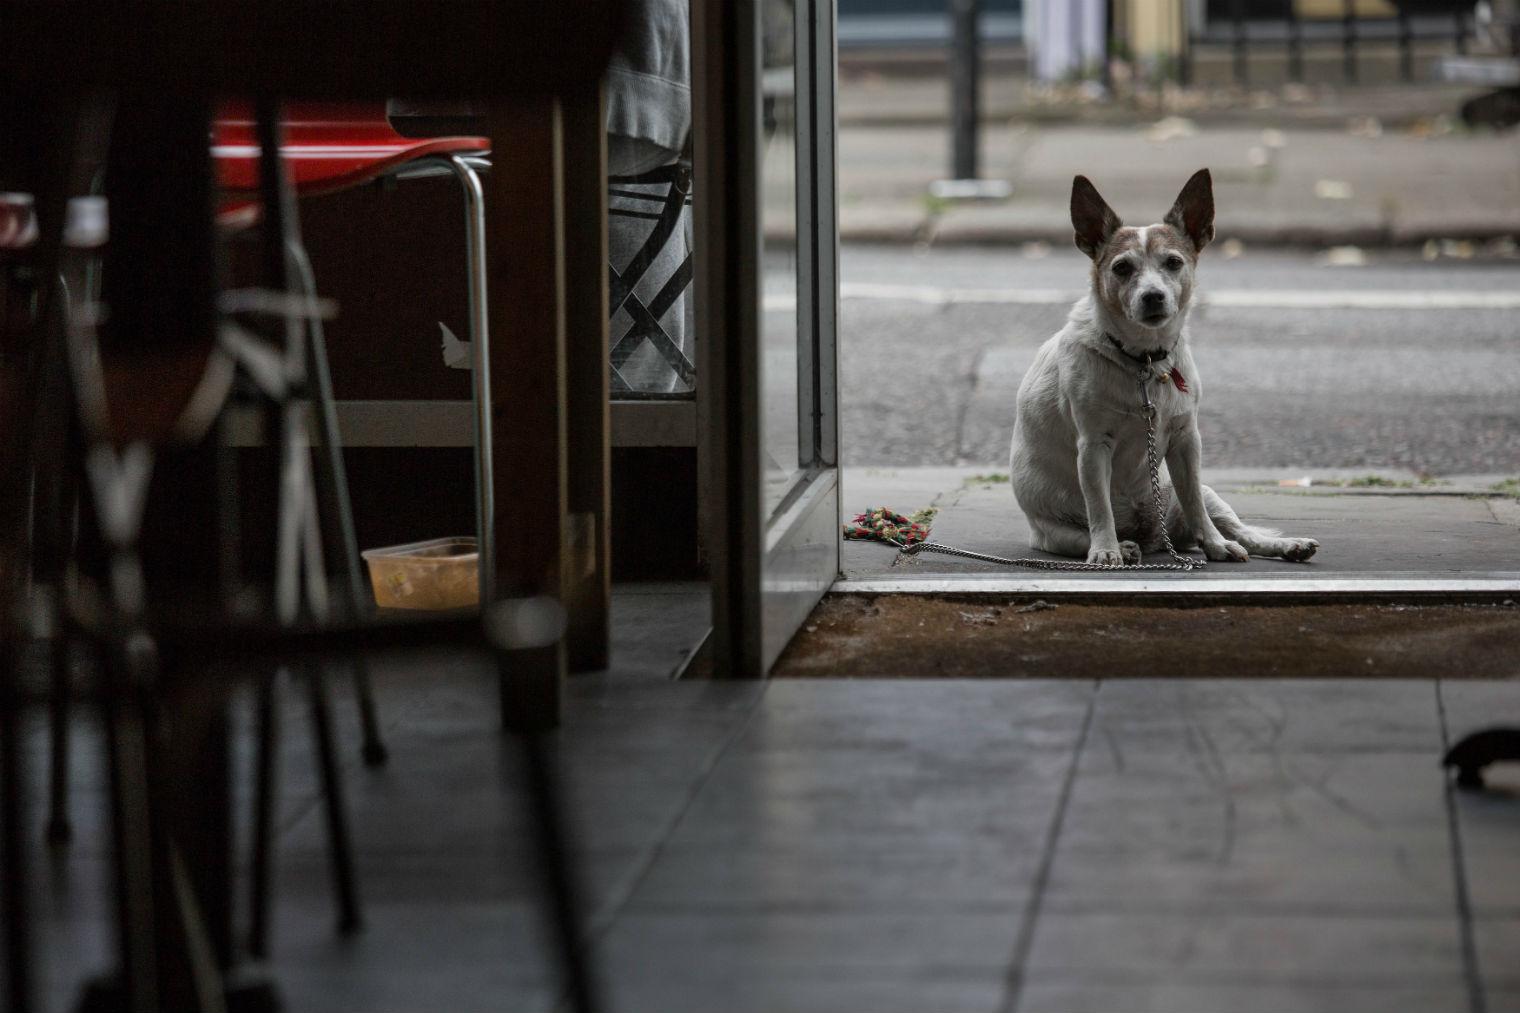 A regular visitor to Mario's. Photo: Dan Hall